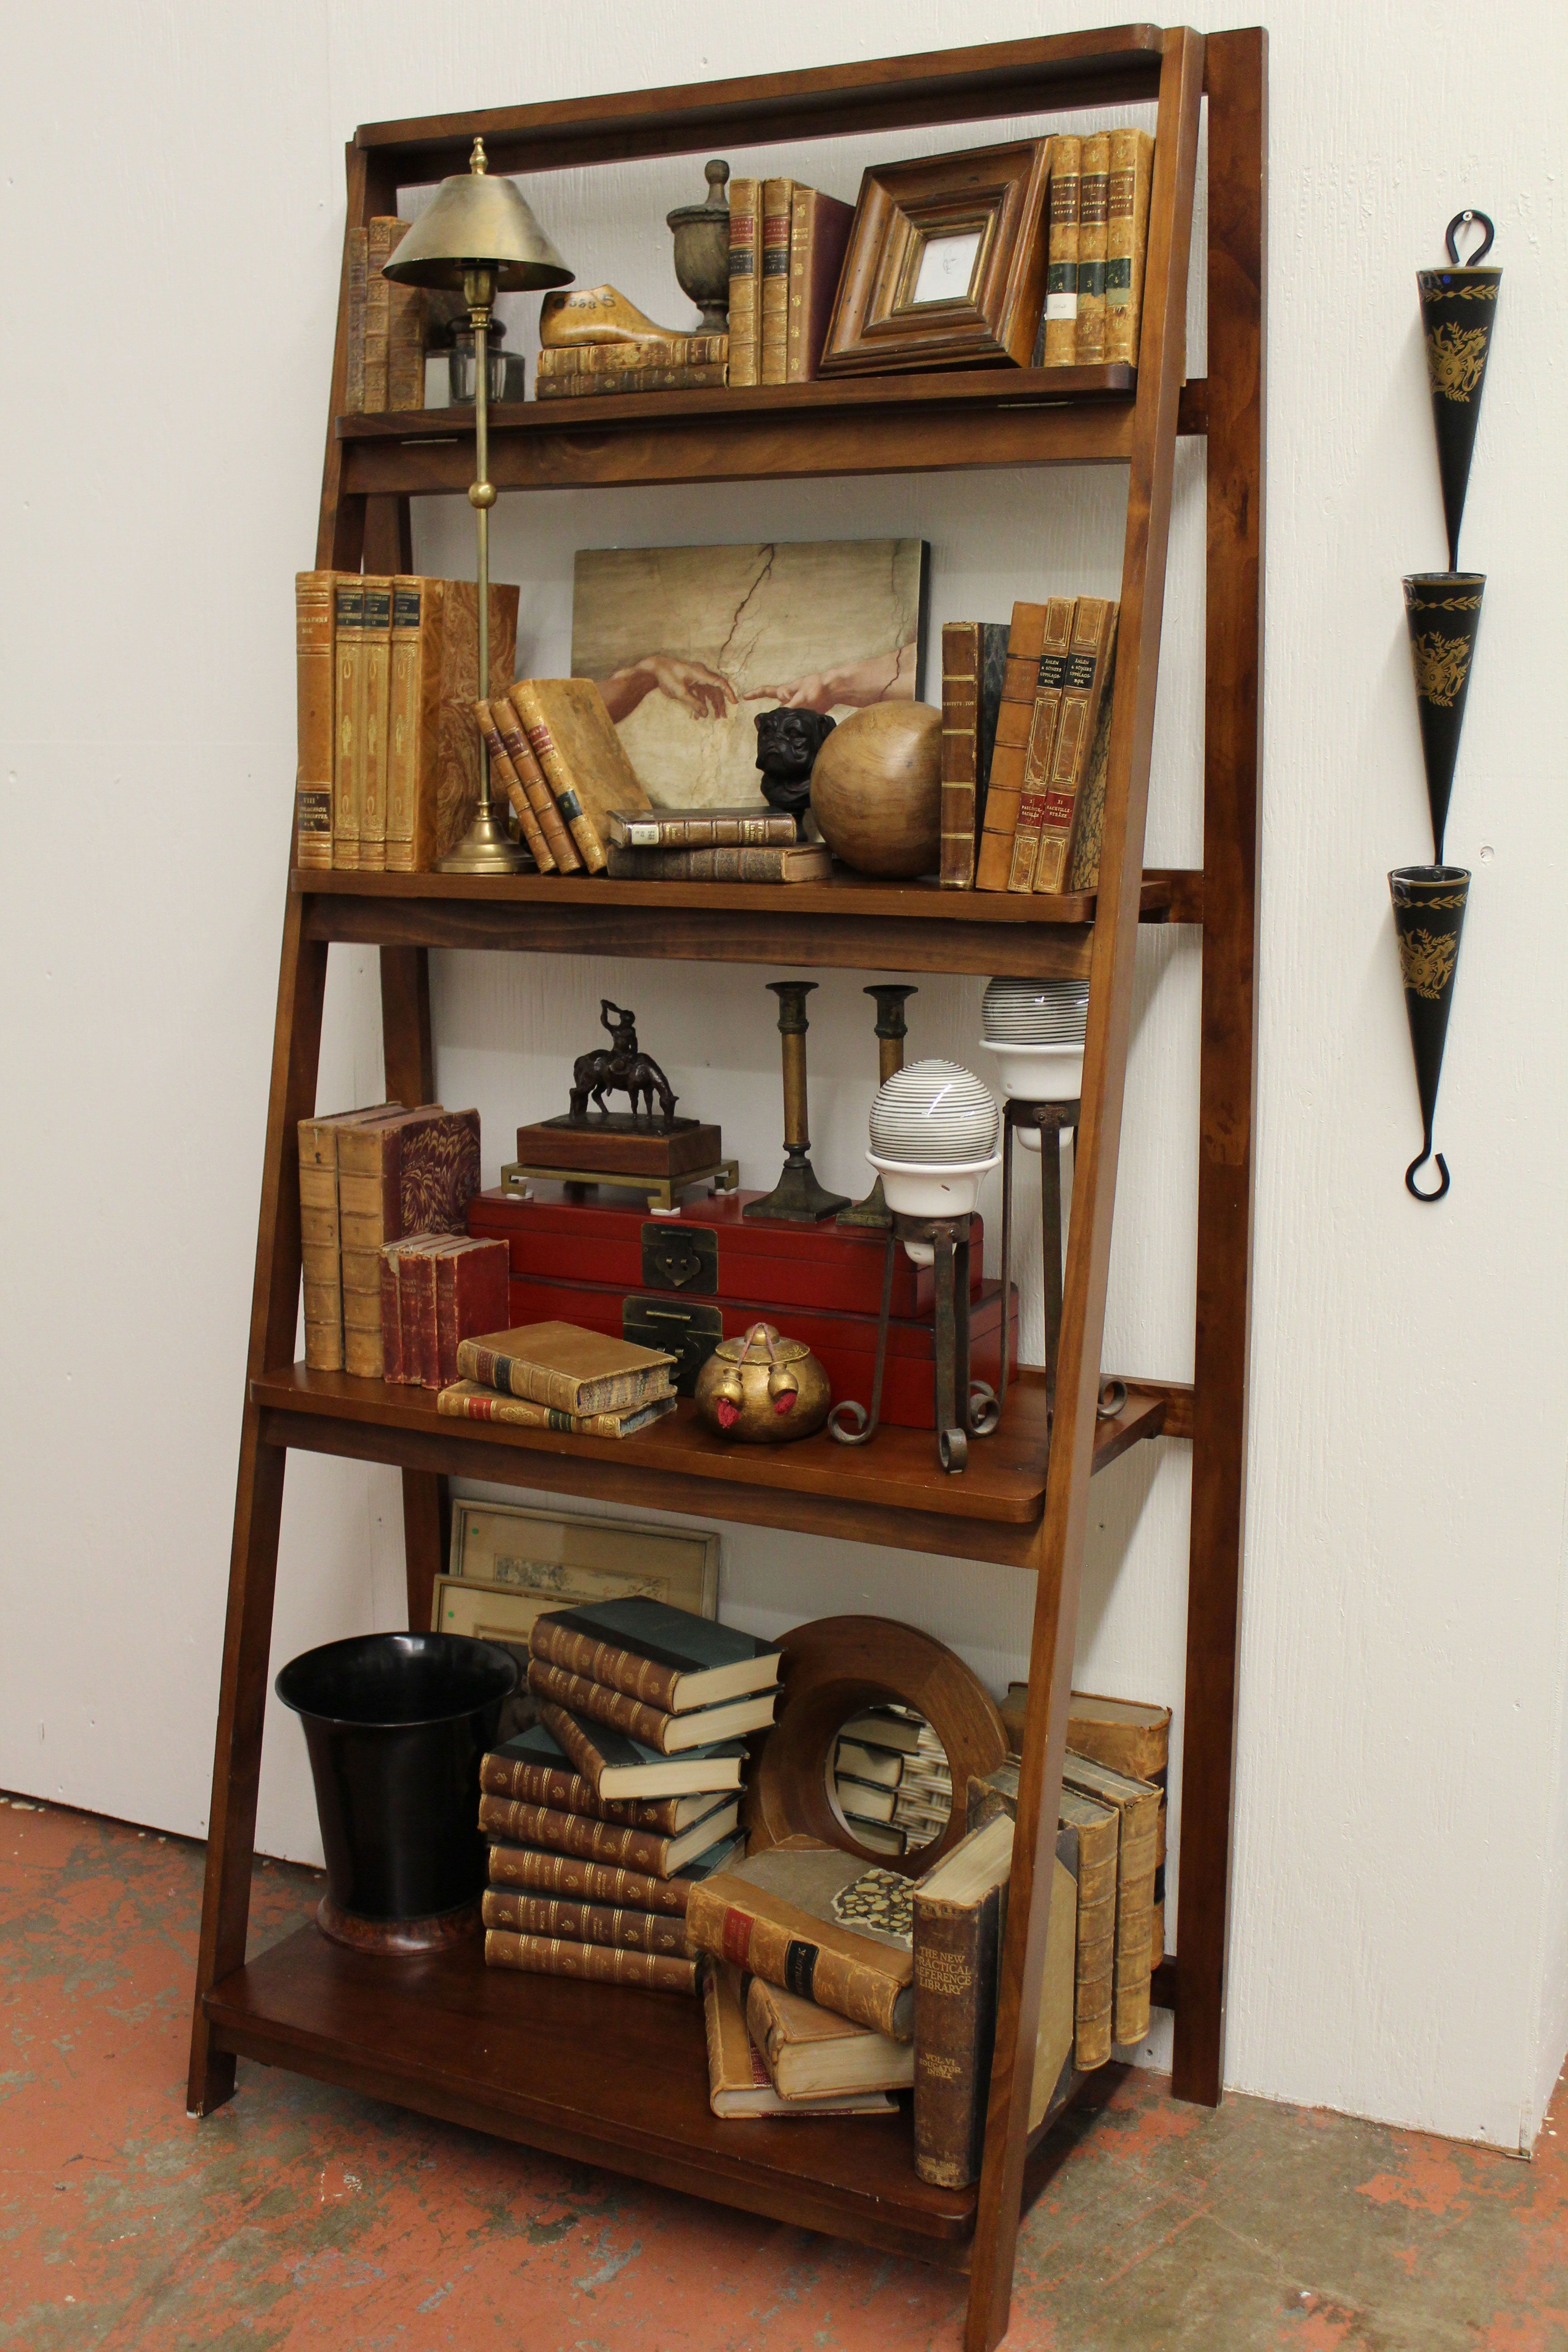 Ladder Shelf as a Library Shelf For the kitchen Pinterest